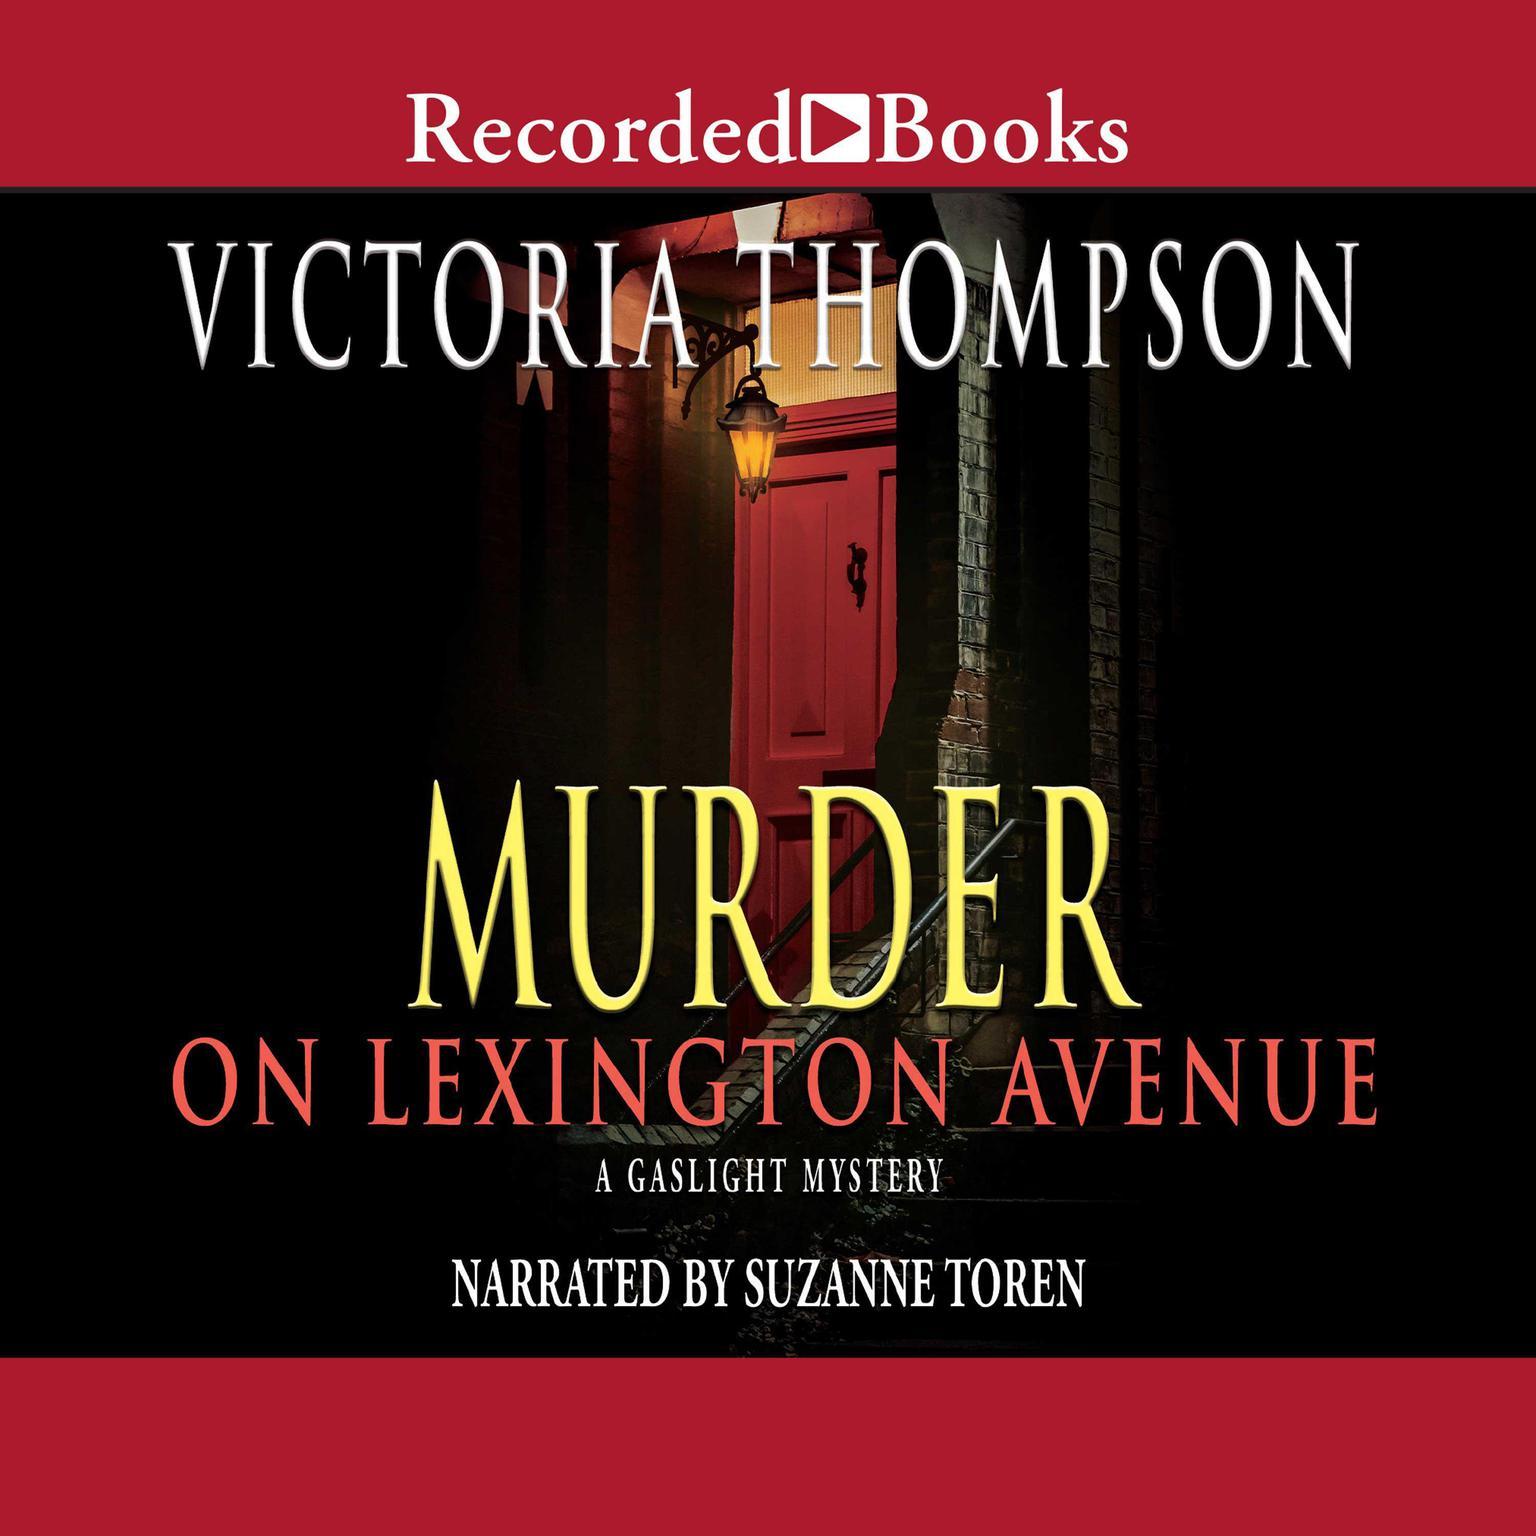 Printable Murder on Lexington Avenue Audiobook Cover Art